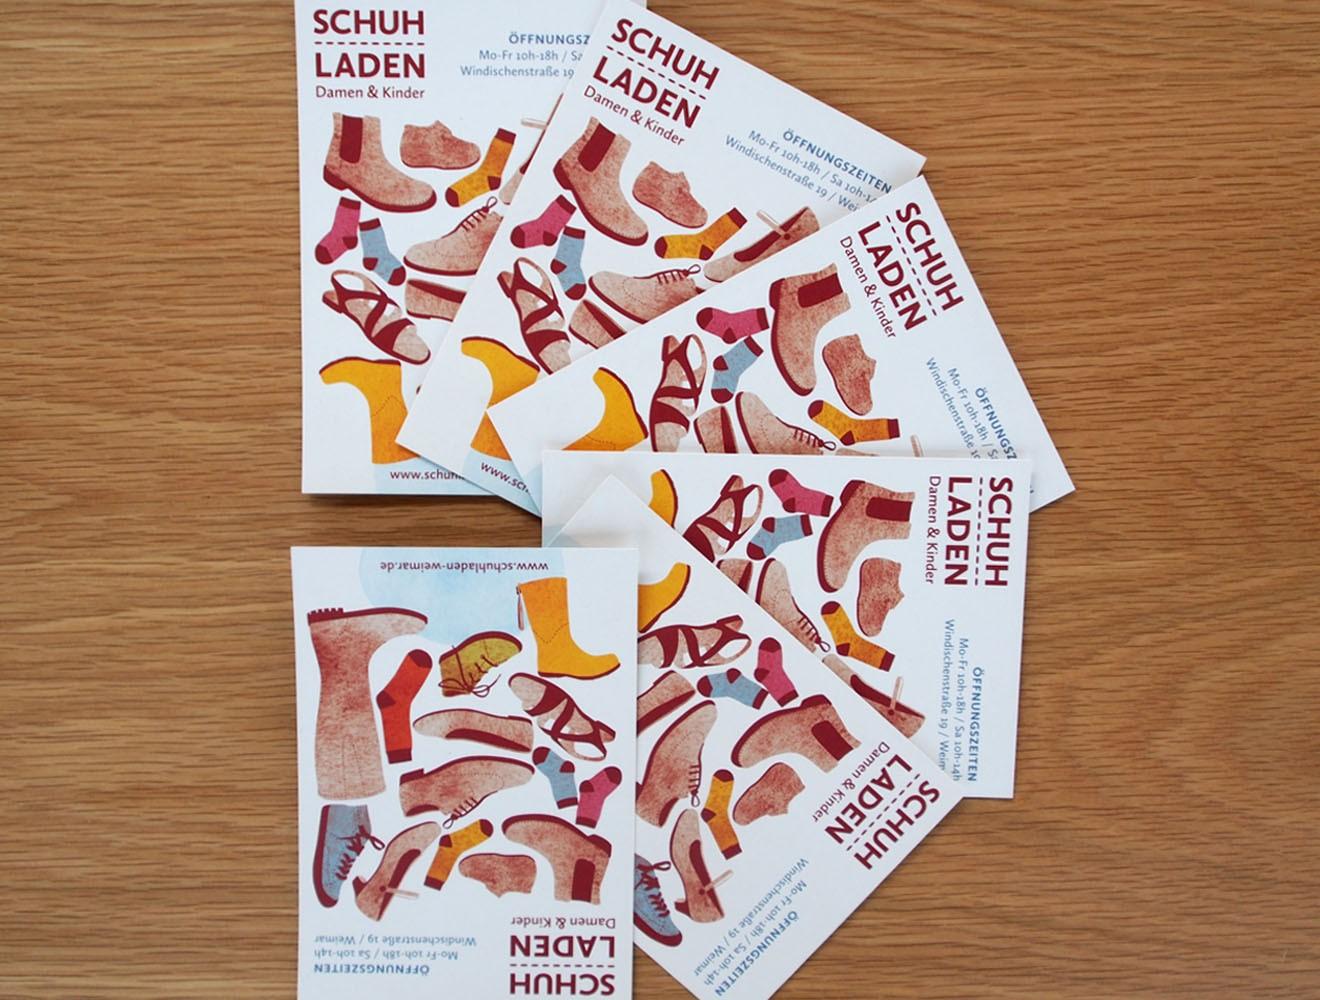 Schuladen // Postkarten